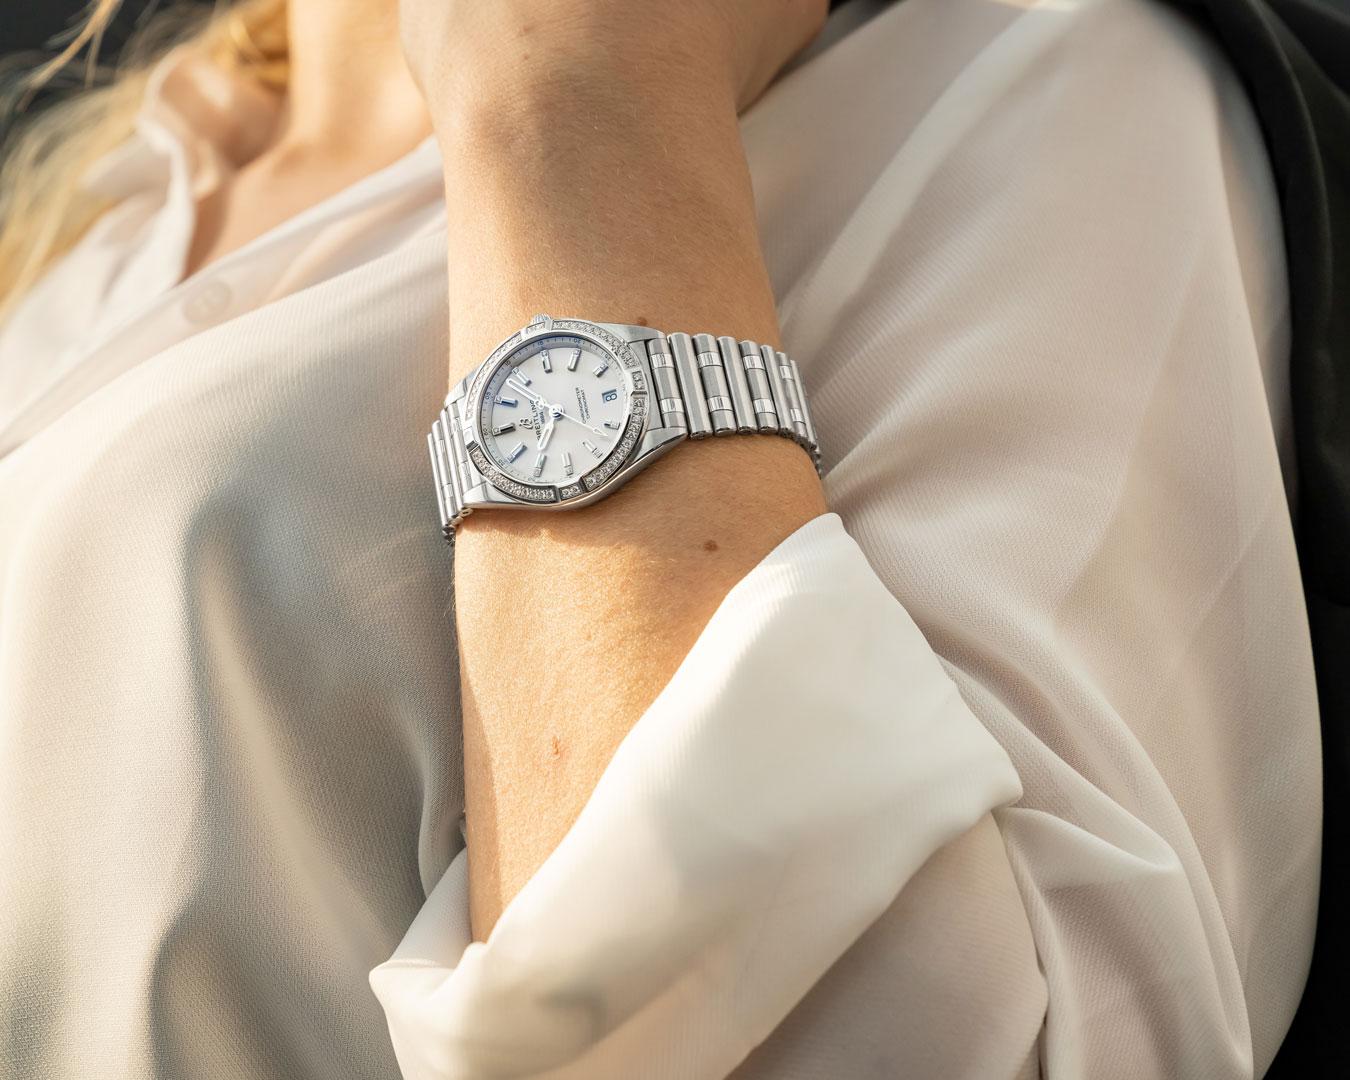 Breitling Chronomat Automatic 36 Diamonds with White Dial